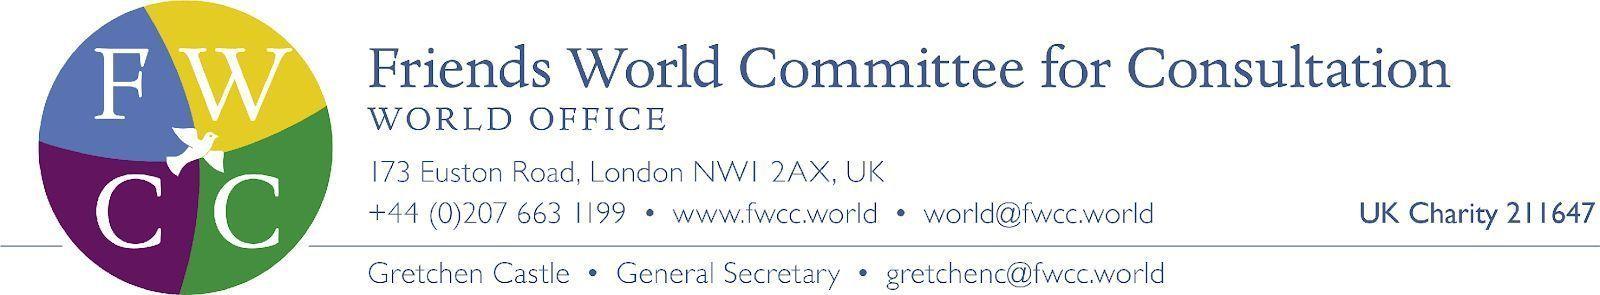 Deadline for applications for FWCC World Office General Secretary